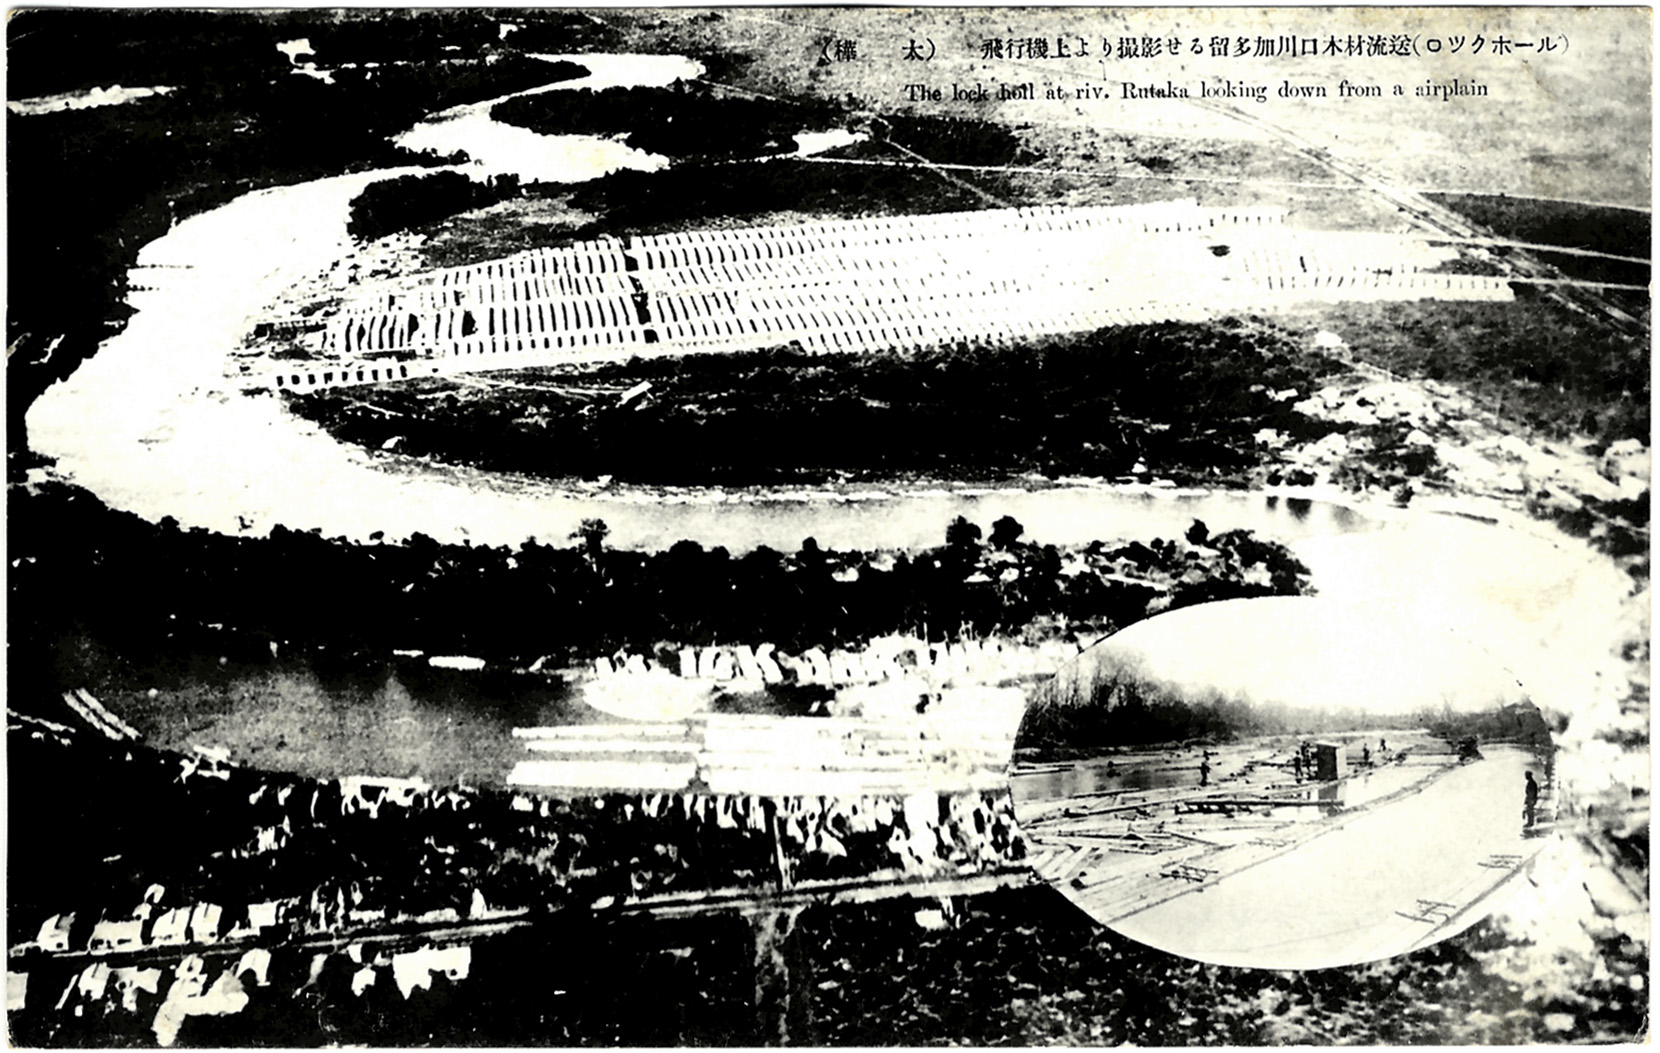 Склад леса рядом с речкой Рутака, фото сделано с самолета